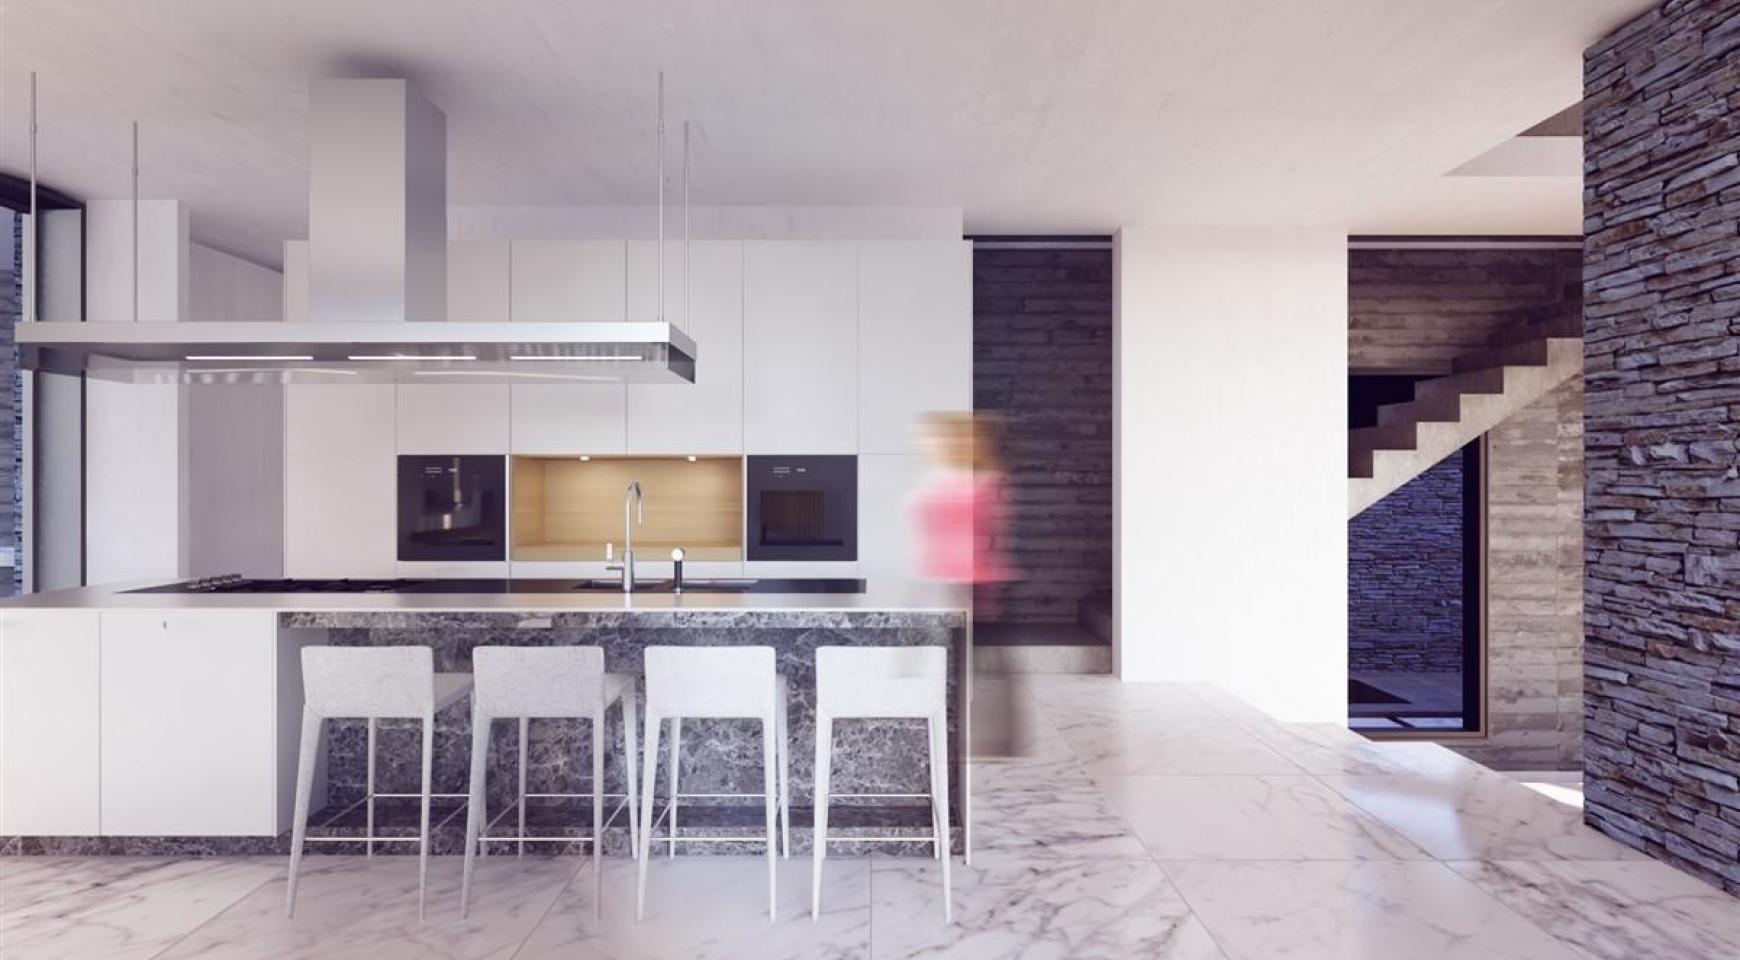 Exclusive 3 Bedroom Villa with Stunning Views in Germasogeia - 7